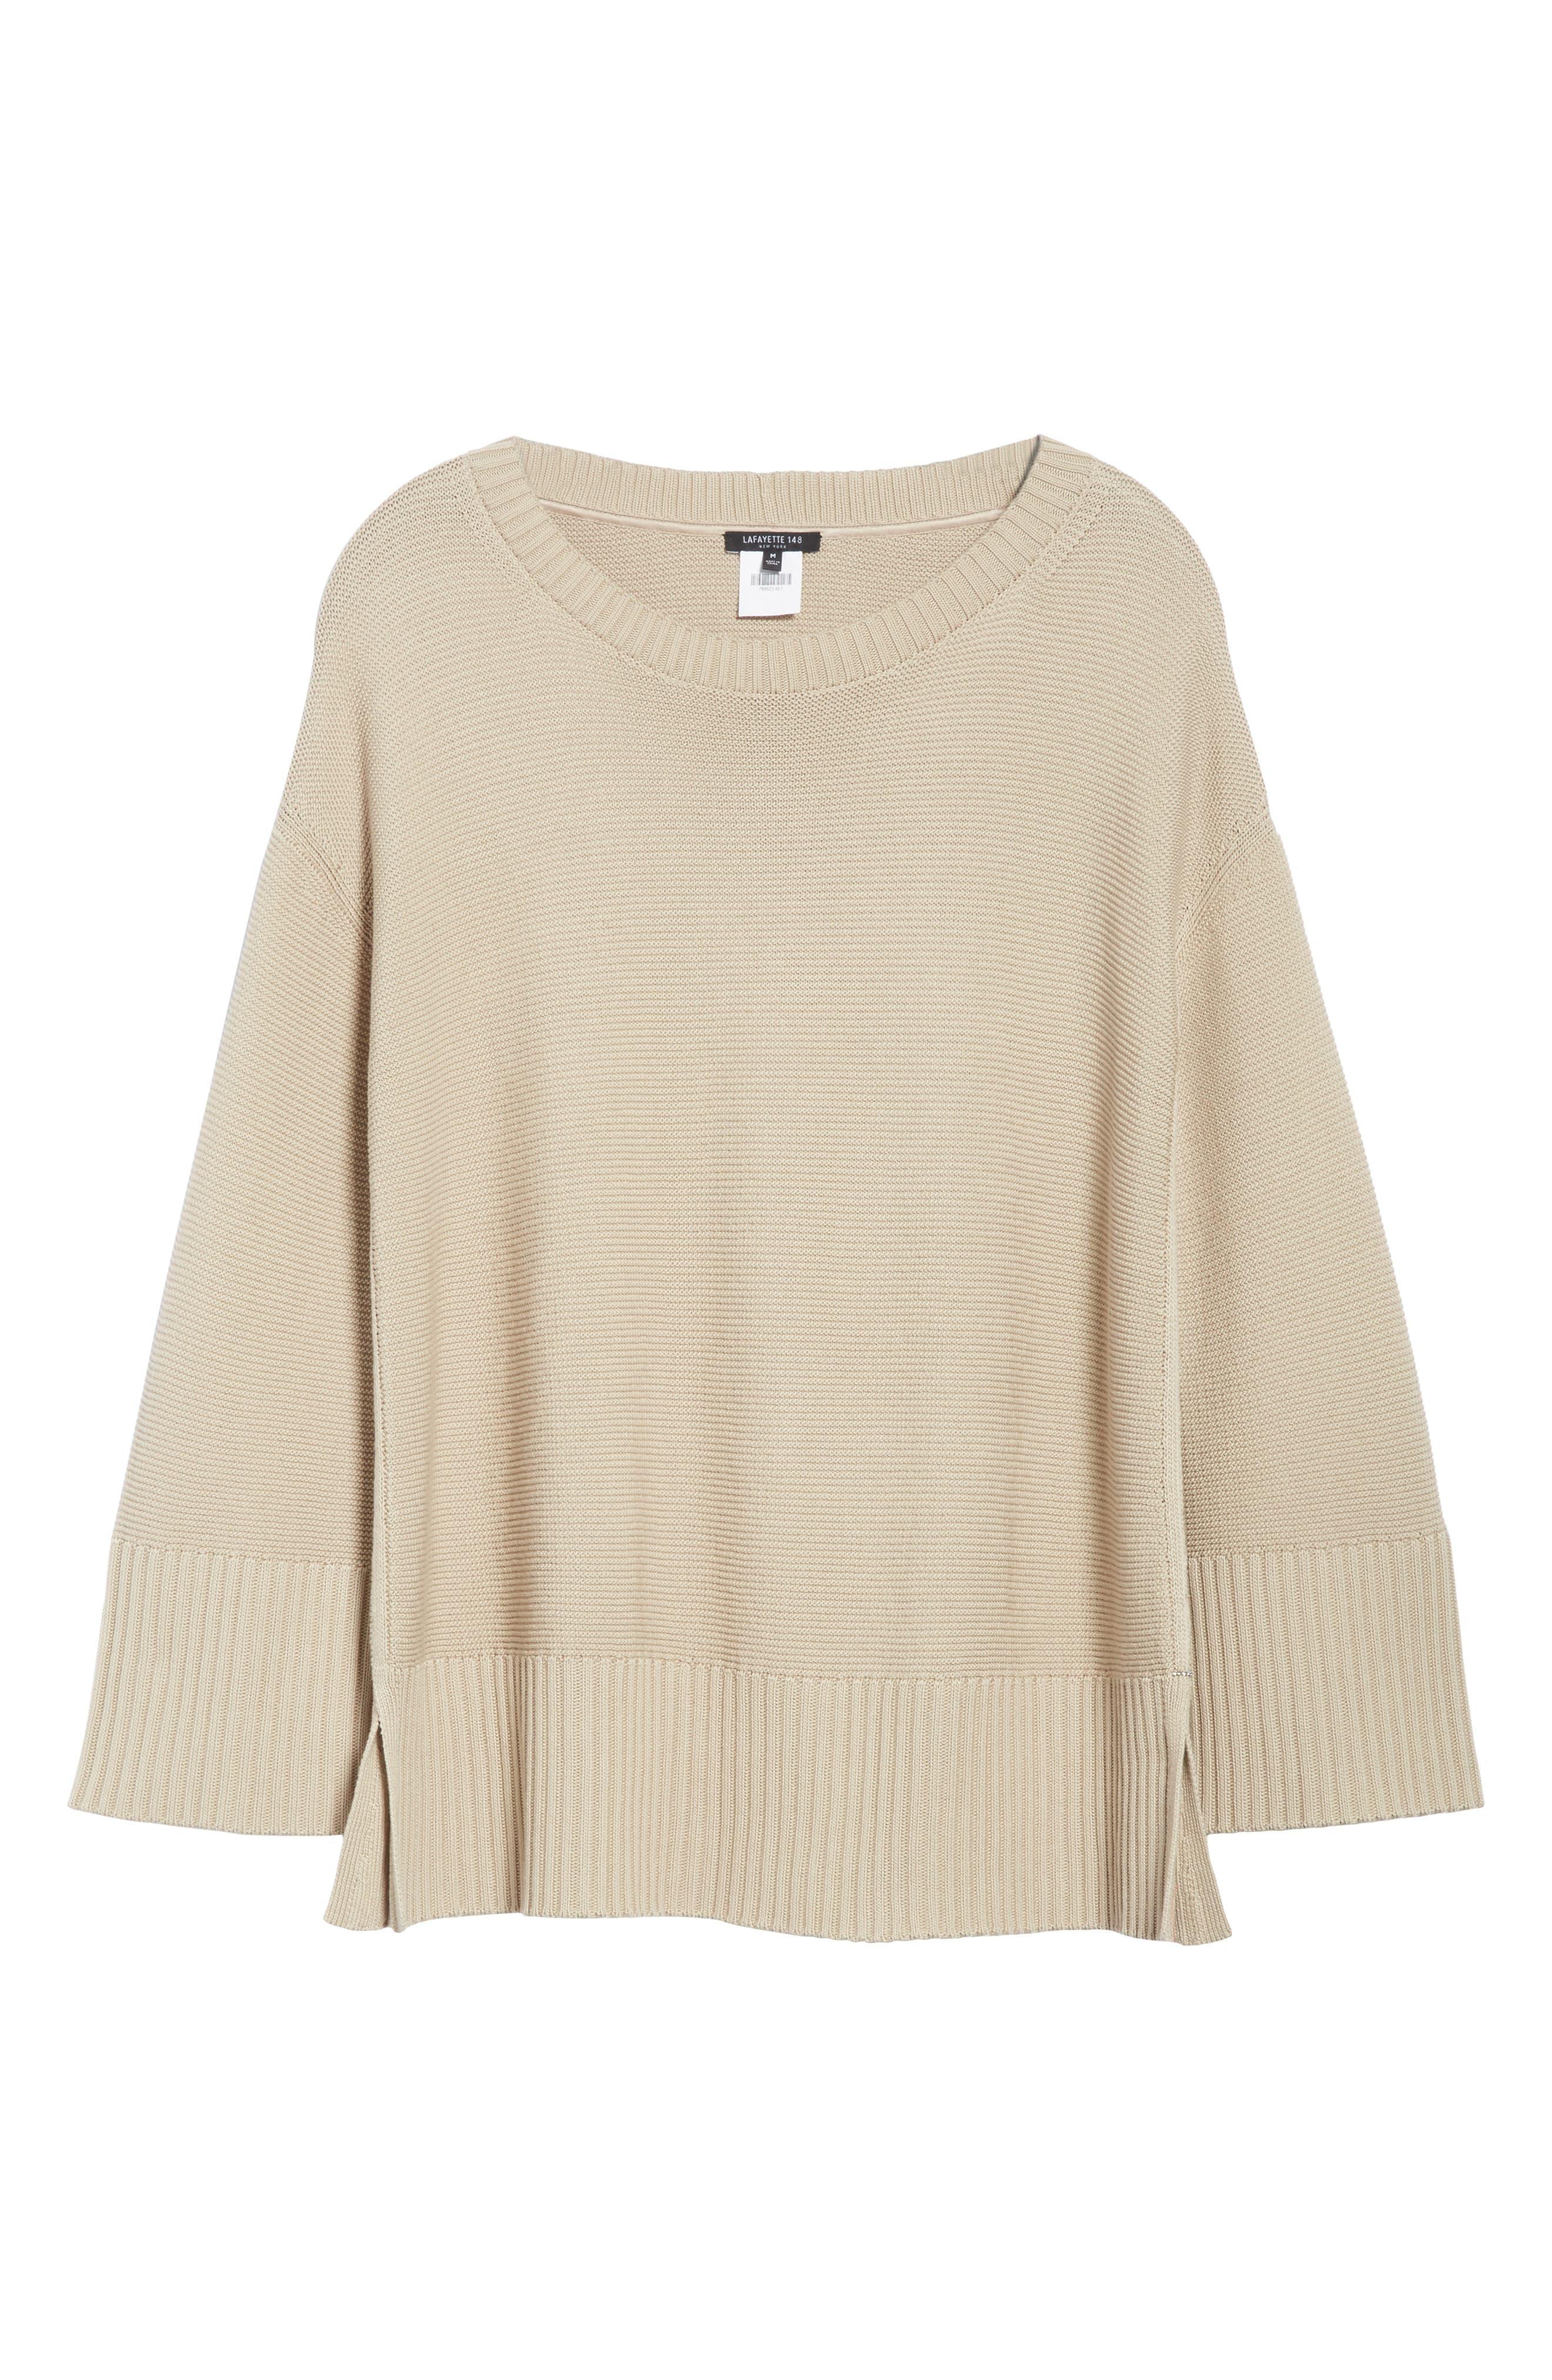 Cotton & Silk Sweater,                             Alternate thumbnail 6, color,                             259